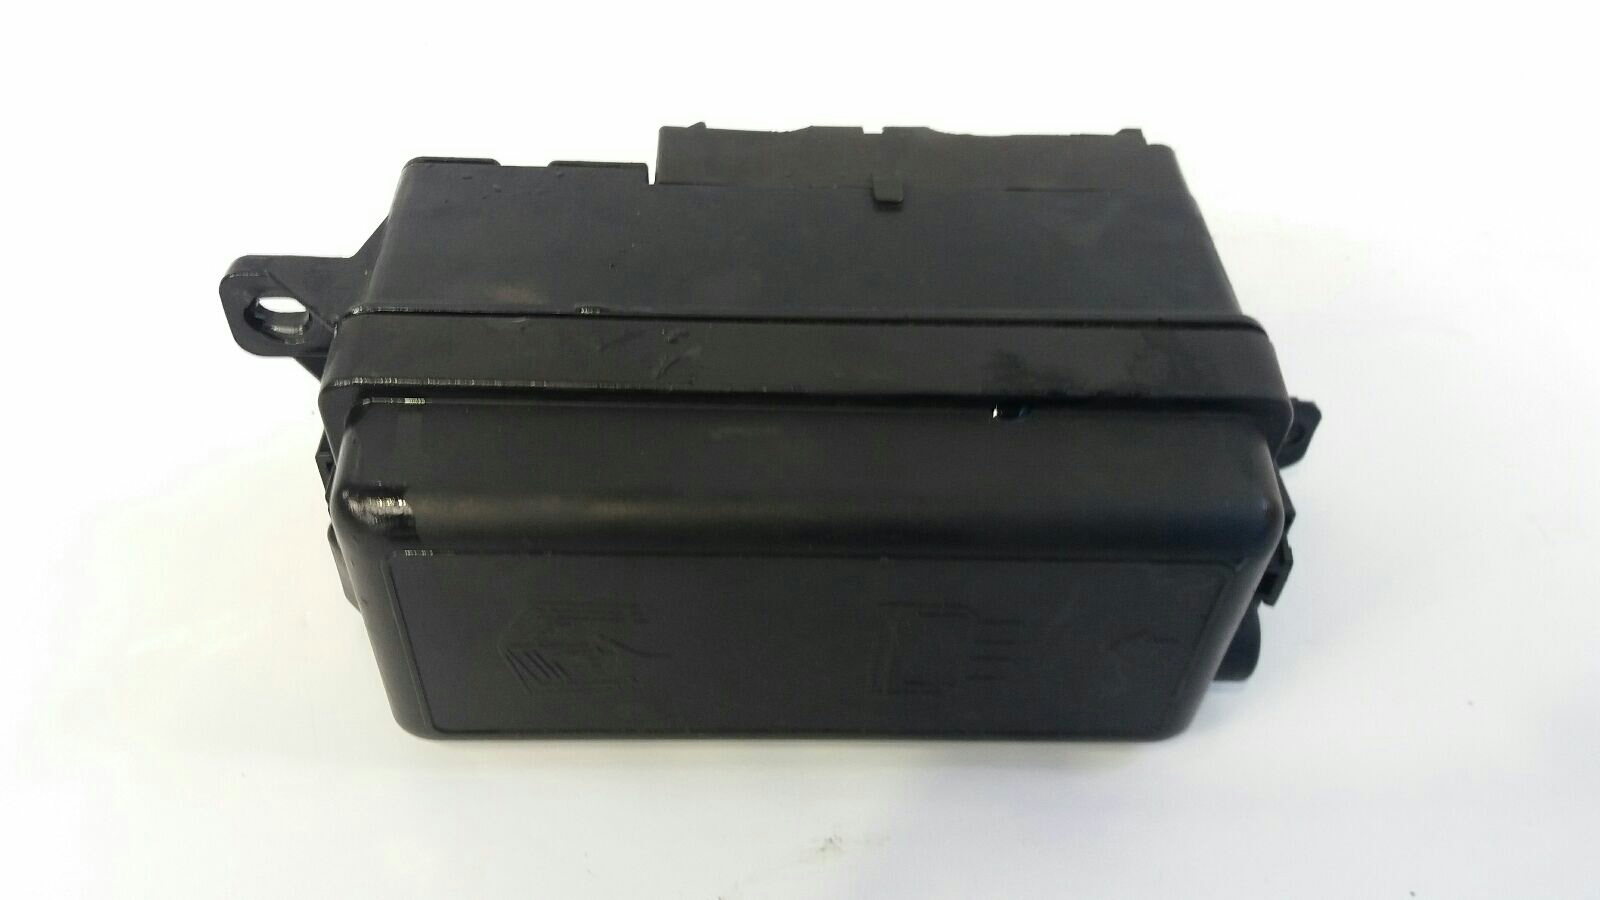 hight resolution of 2010 mini mini 2007 to 2014 1 6 petrol n18b16 fuse box spare 2014 dodge challenger fuse box 2014 mini cooper fuse box